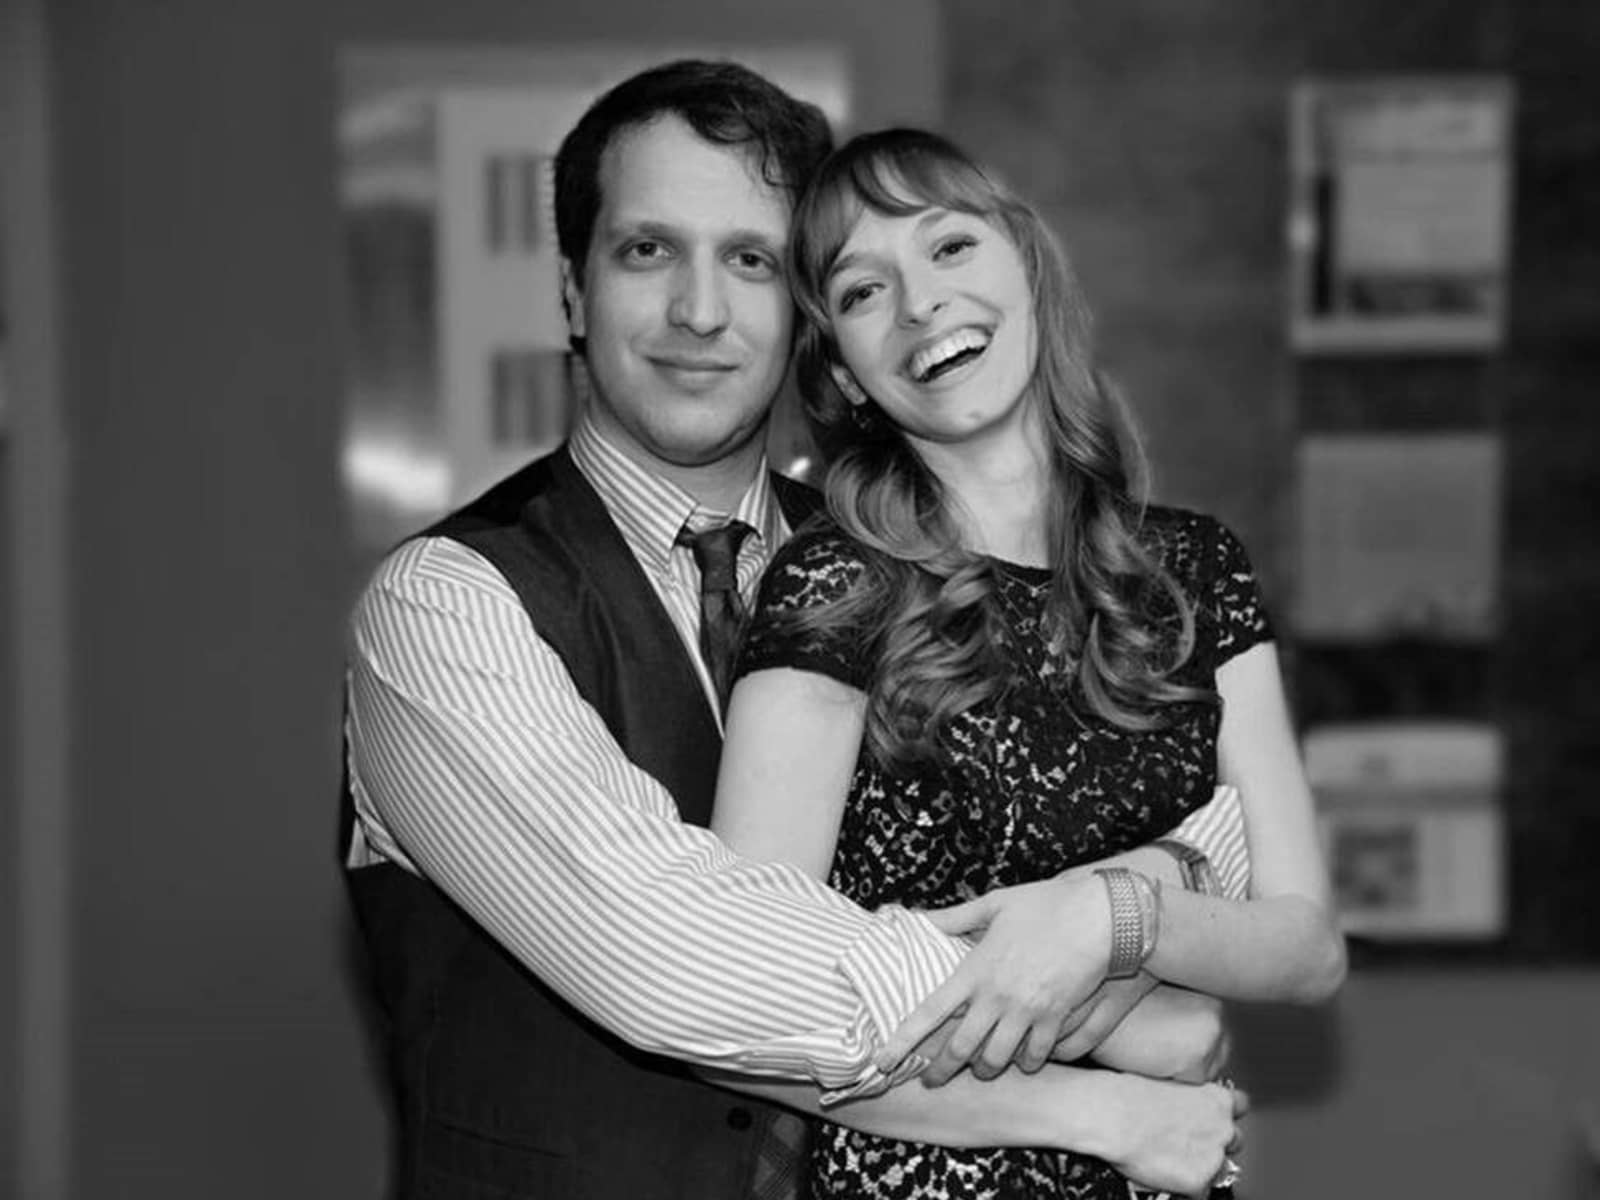 Dr. michael & Gita from Toronto, Ontario, Canada